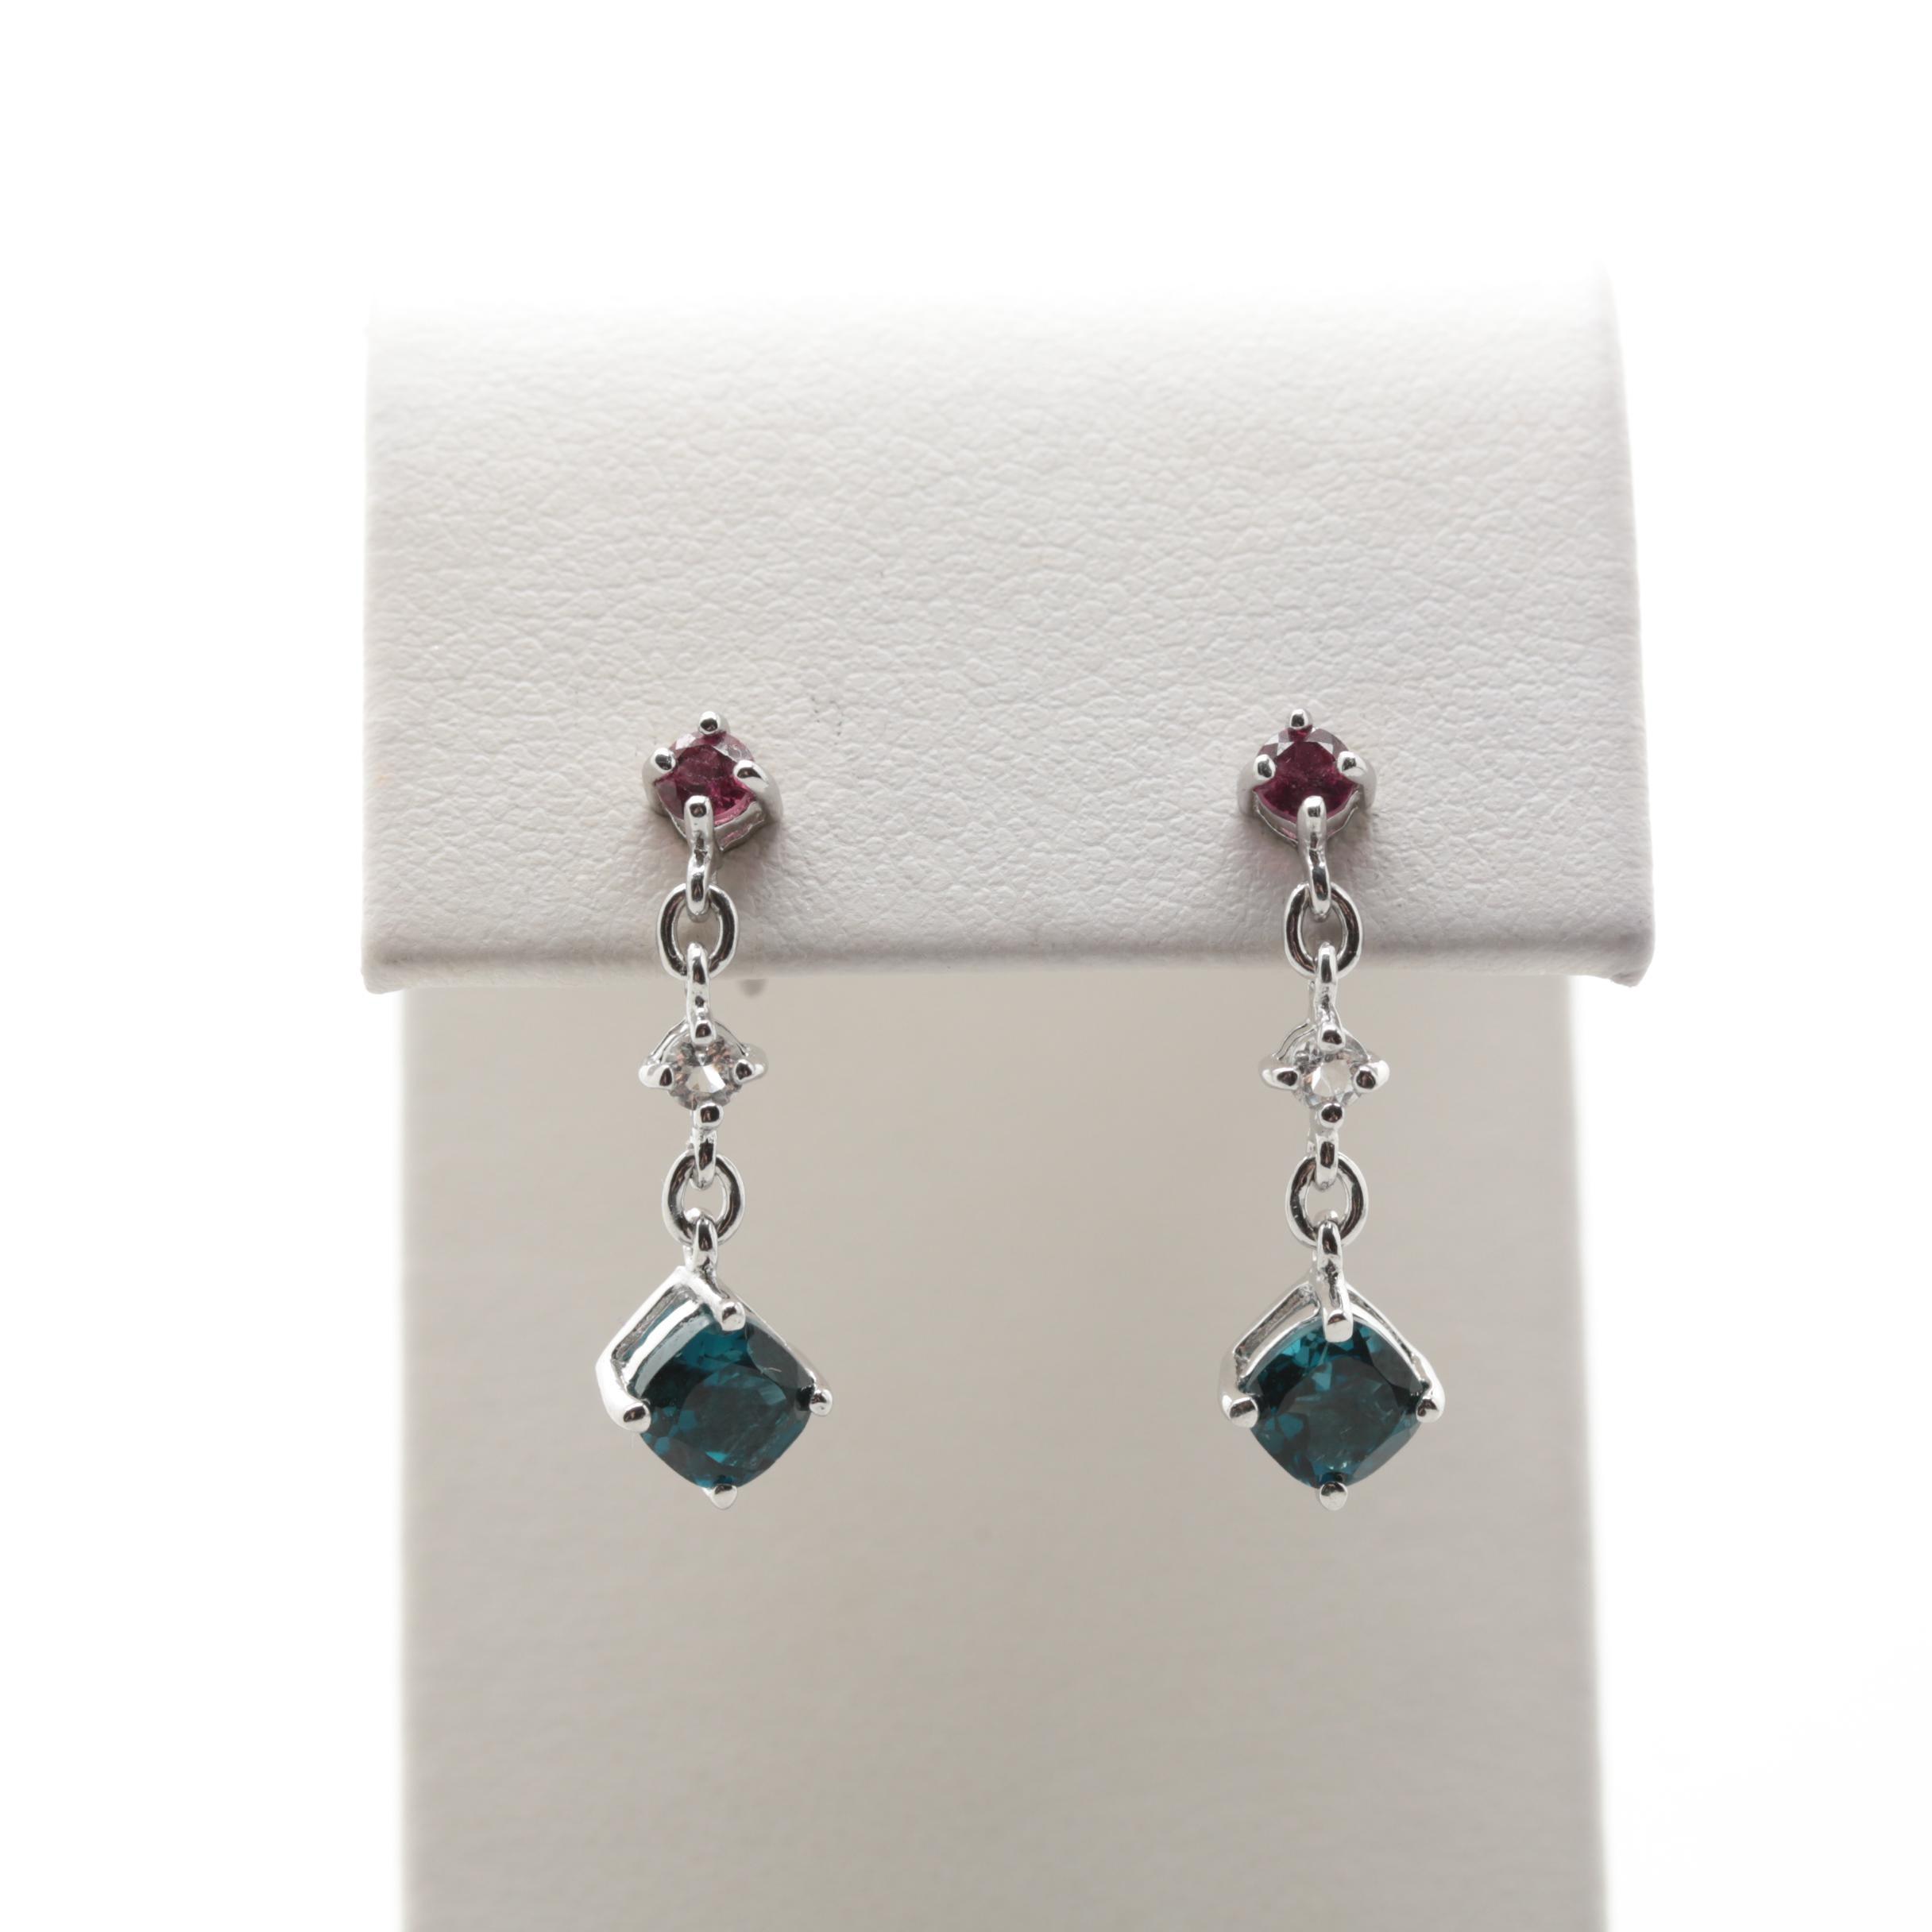 Sterling Silver Rhodolite Garnet and Topaz Drop Earrings